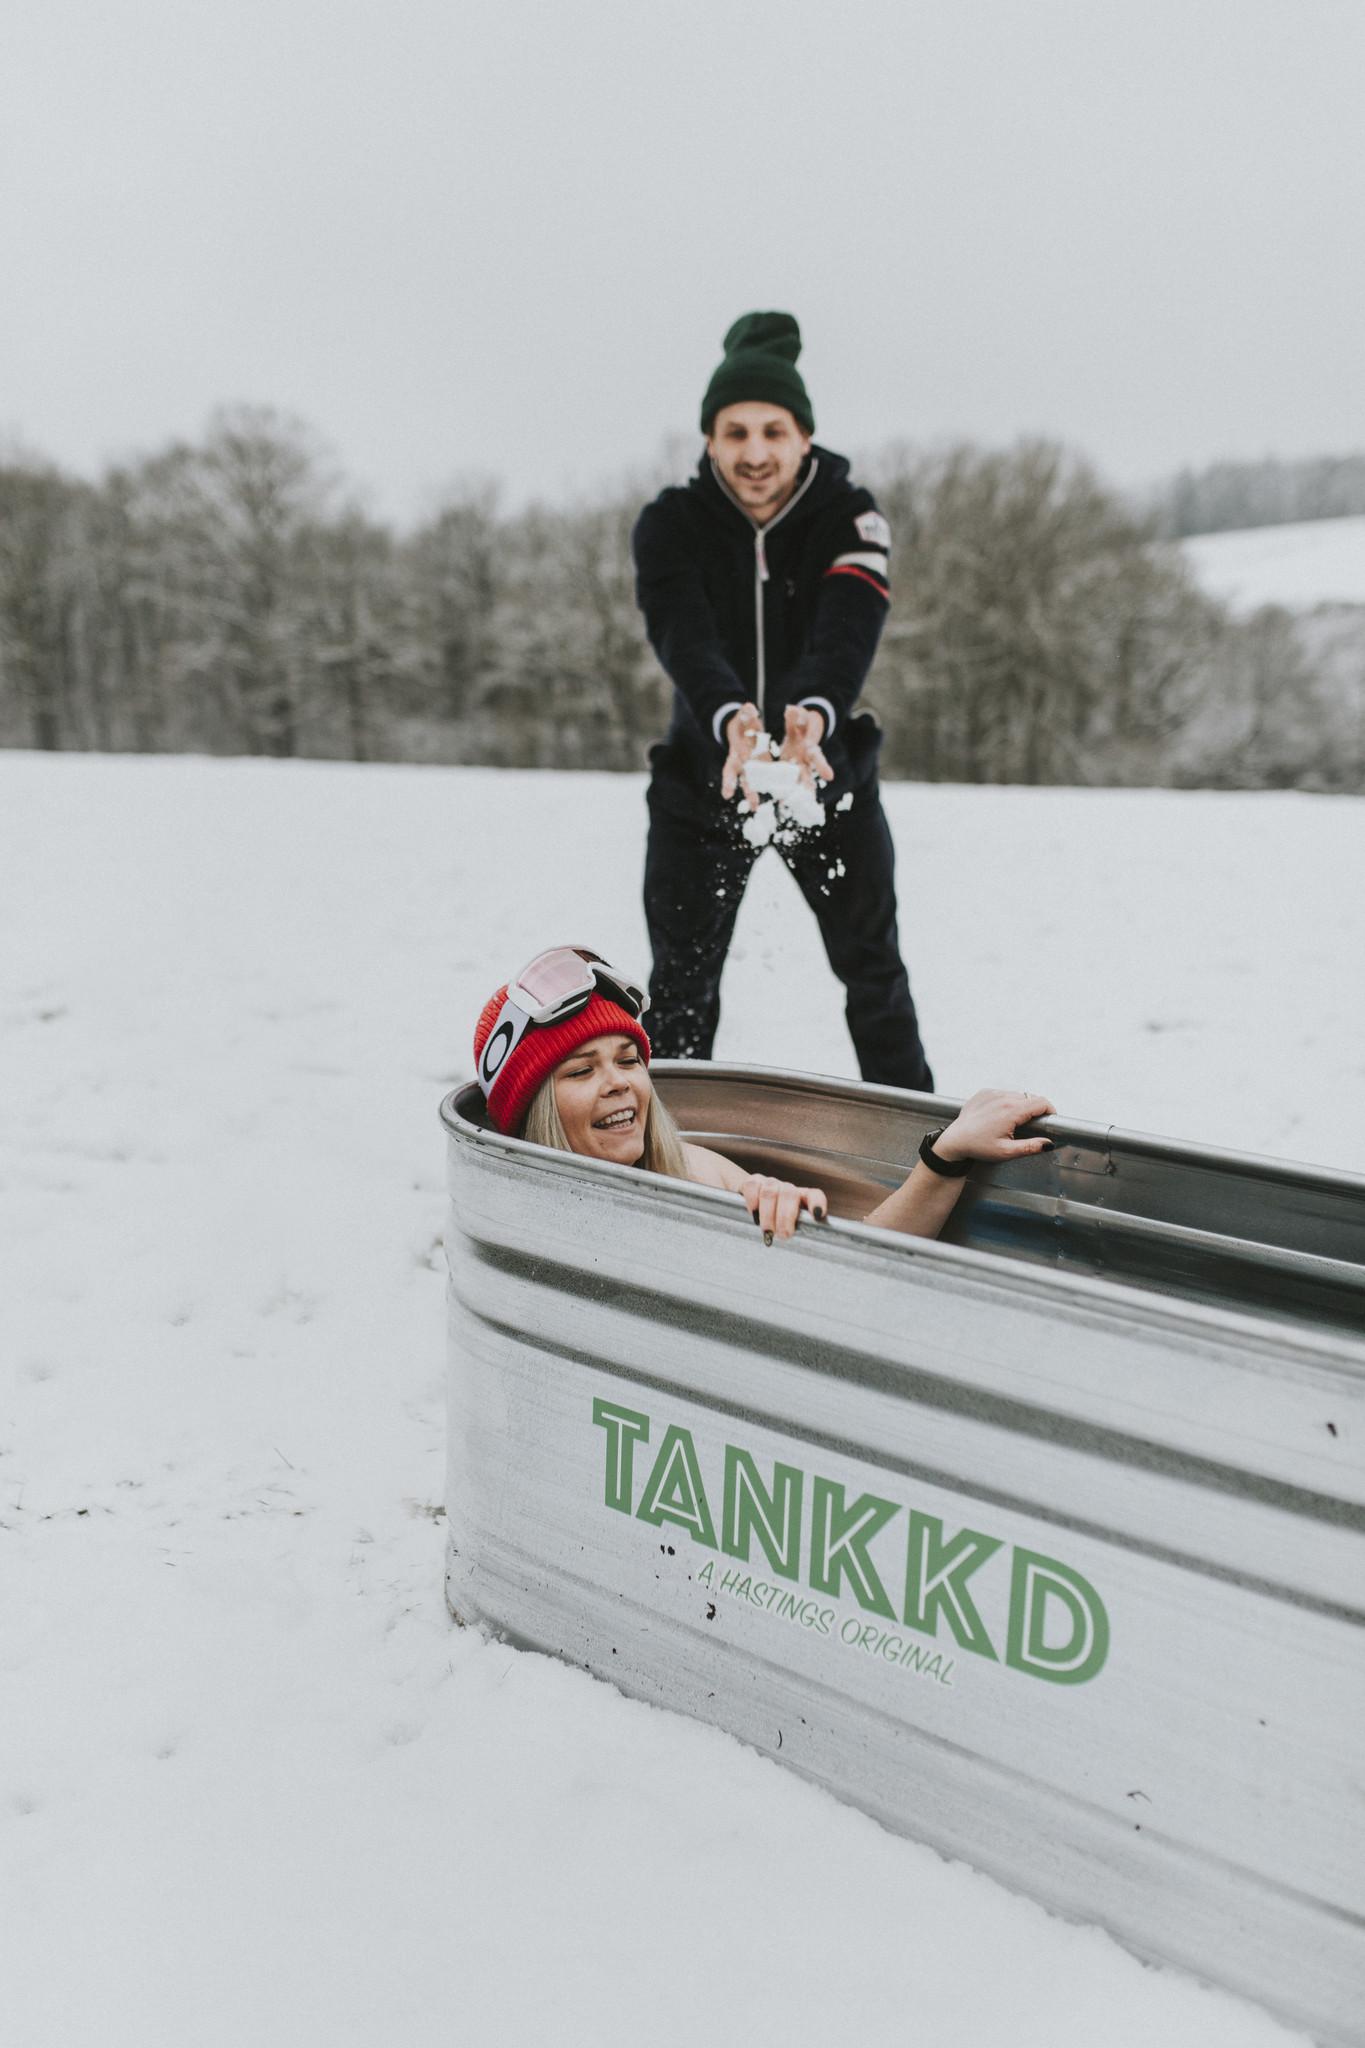 Tankkd Eskimo pack basic-6